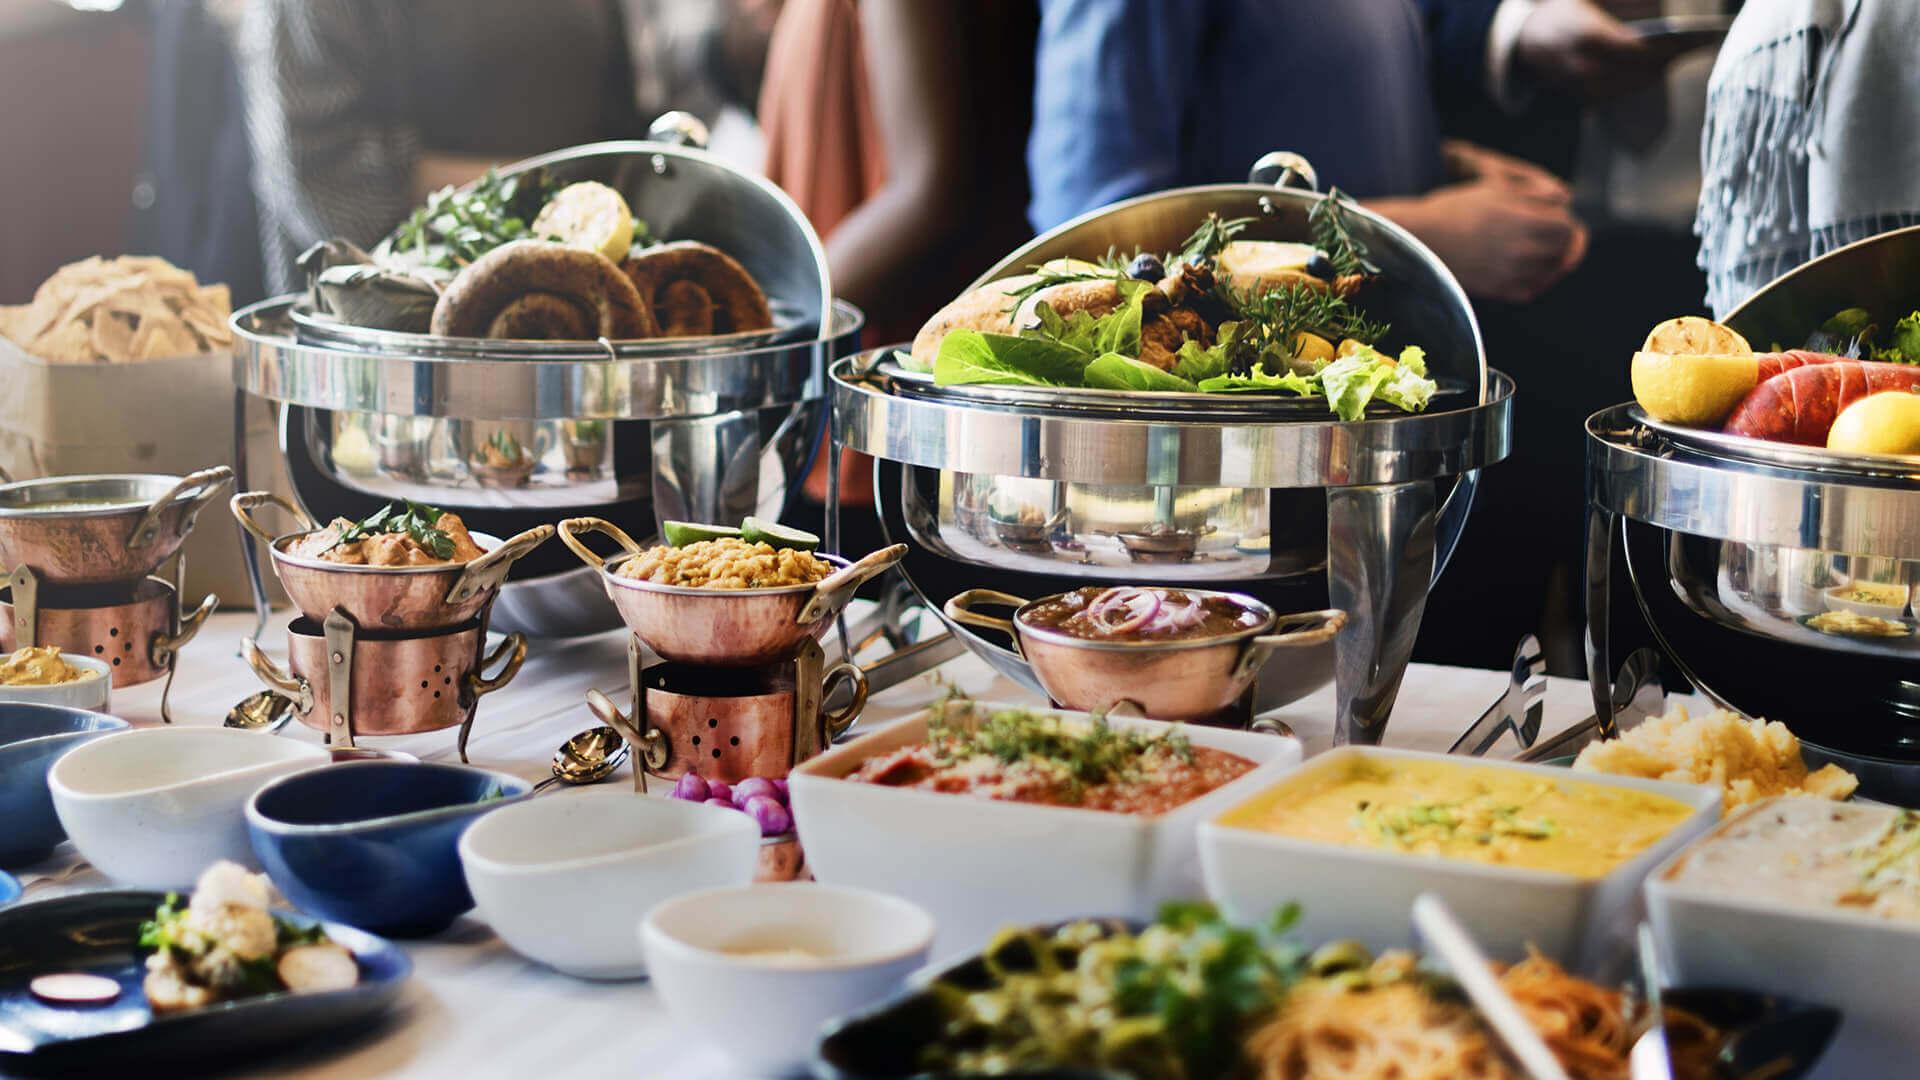 Kreuzfahrt Kulinarik auf den Weltmeeren mit Christophorus Reisen